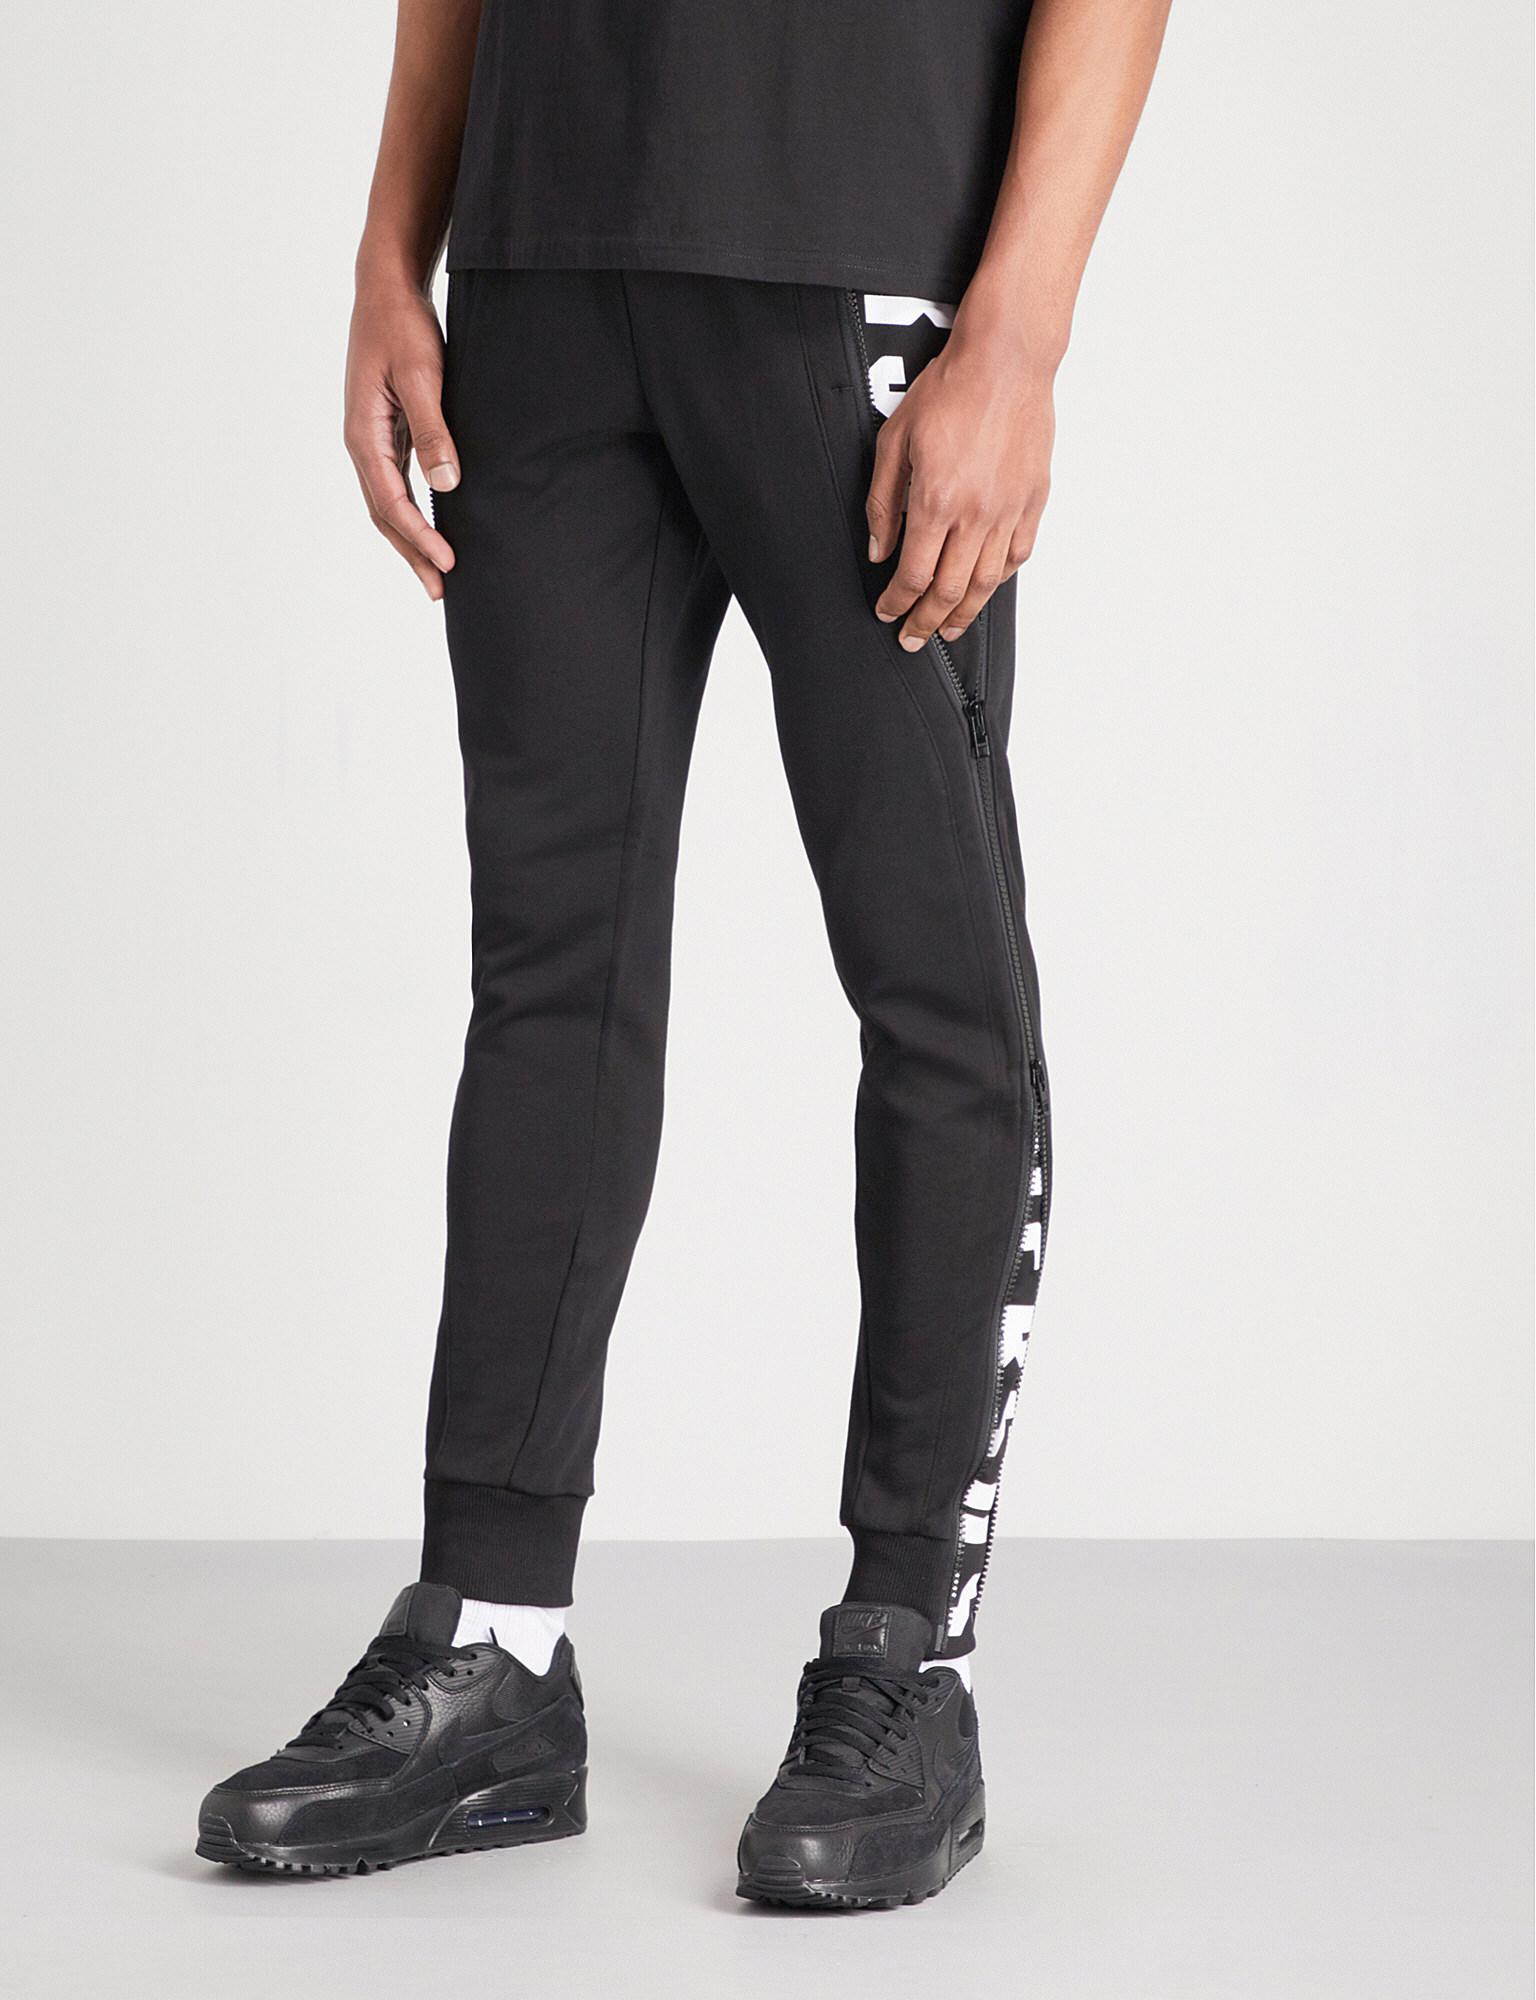 Versus. Men's Black Zip-embellished Cotton-jersey Jogging Bottoms